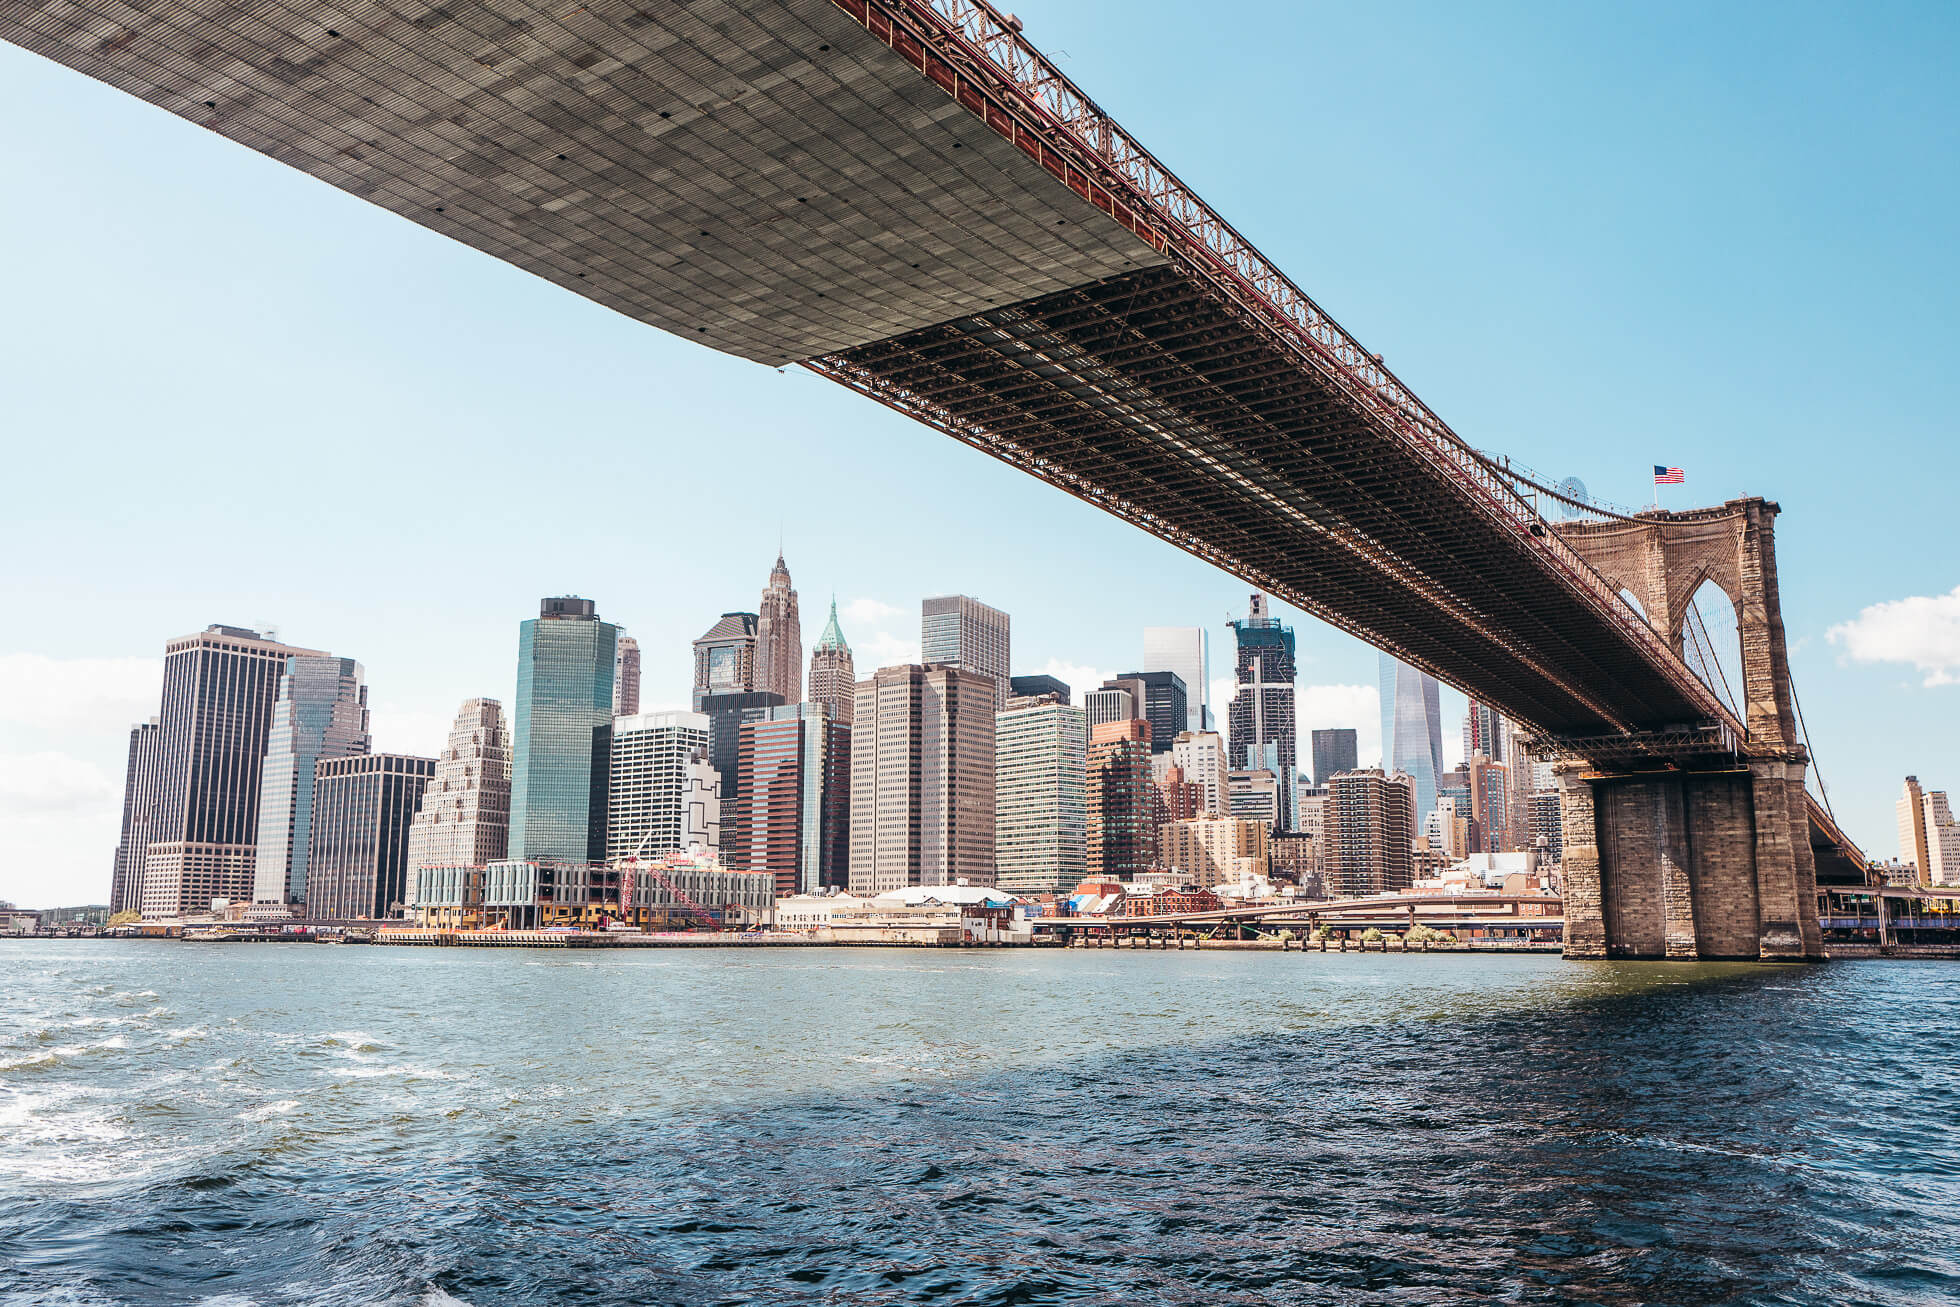 janni-deler-new-york-tour-boatL1090473